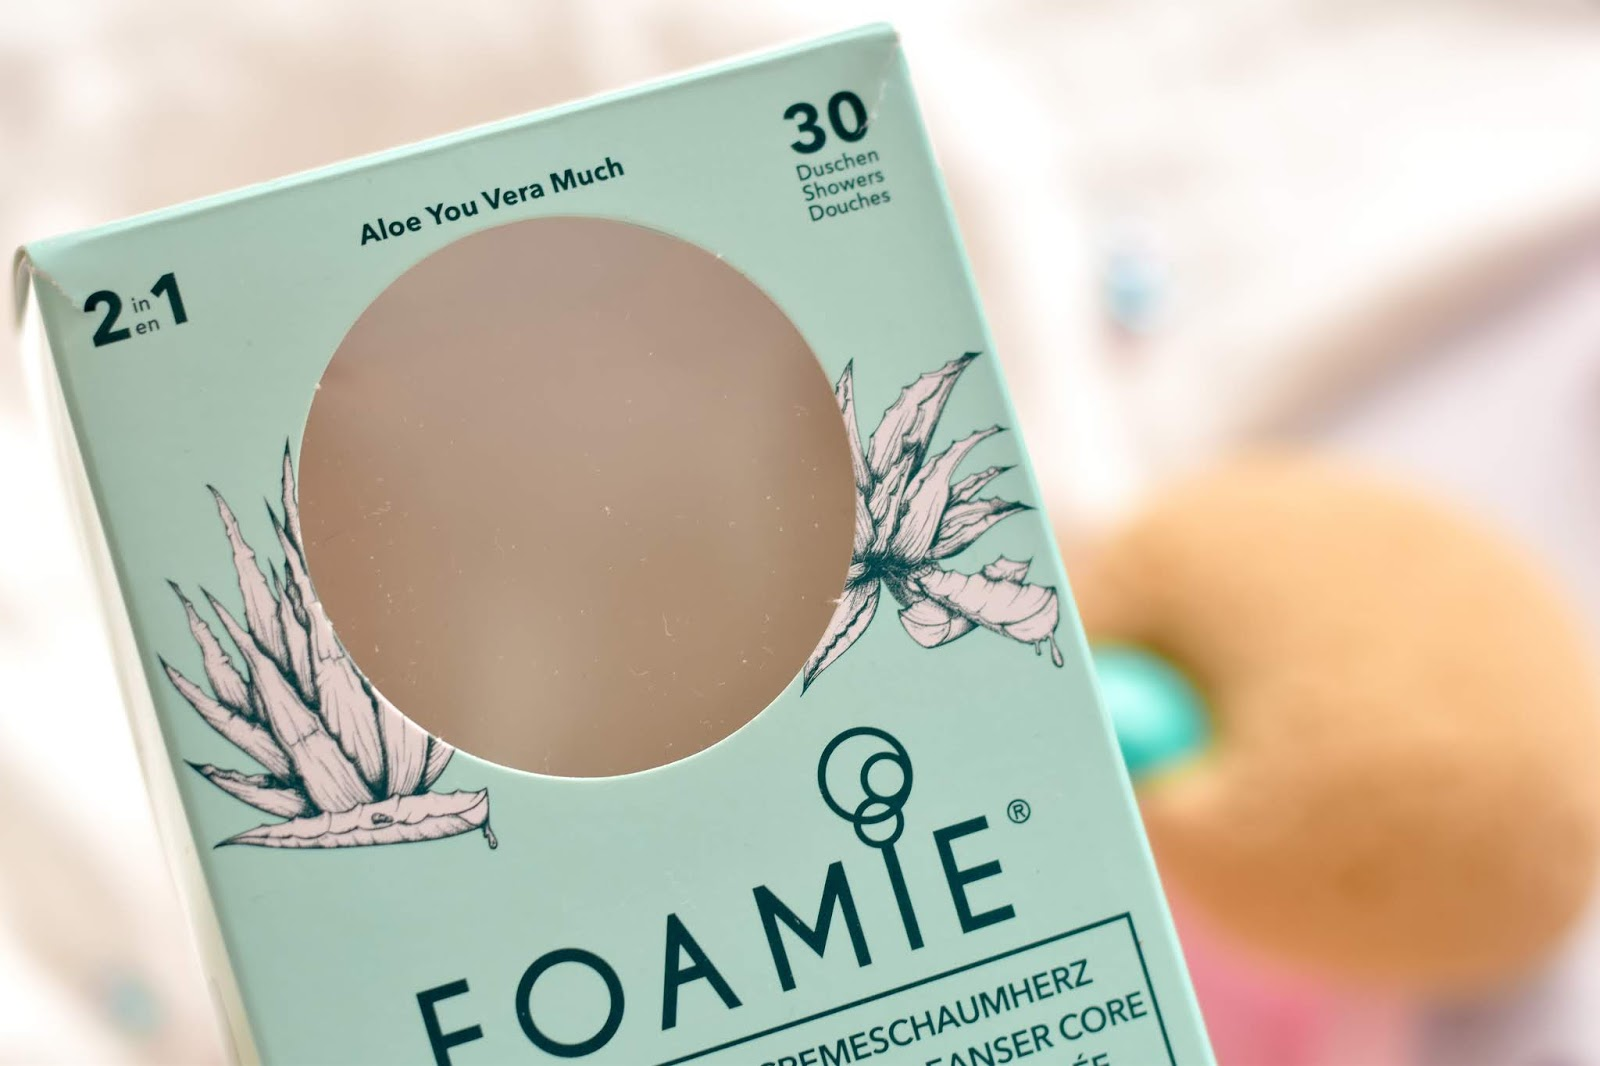 Foamie Aloe You Vera Much